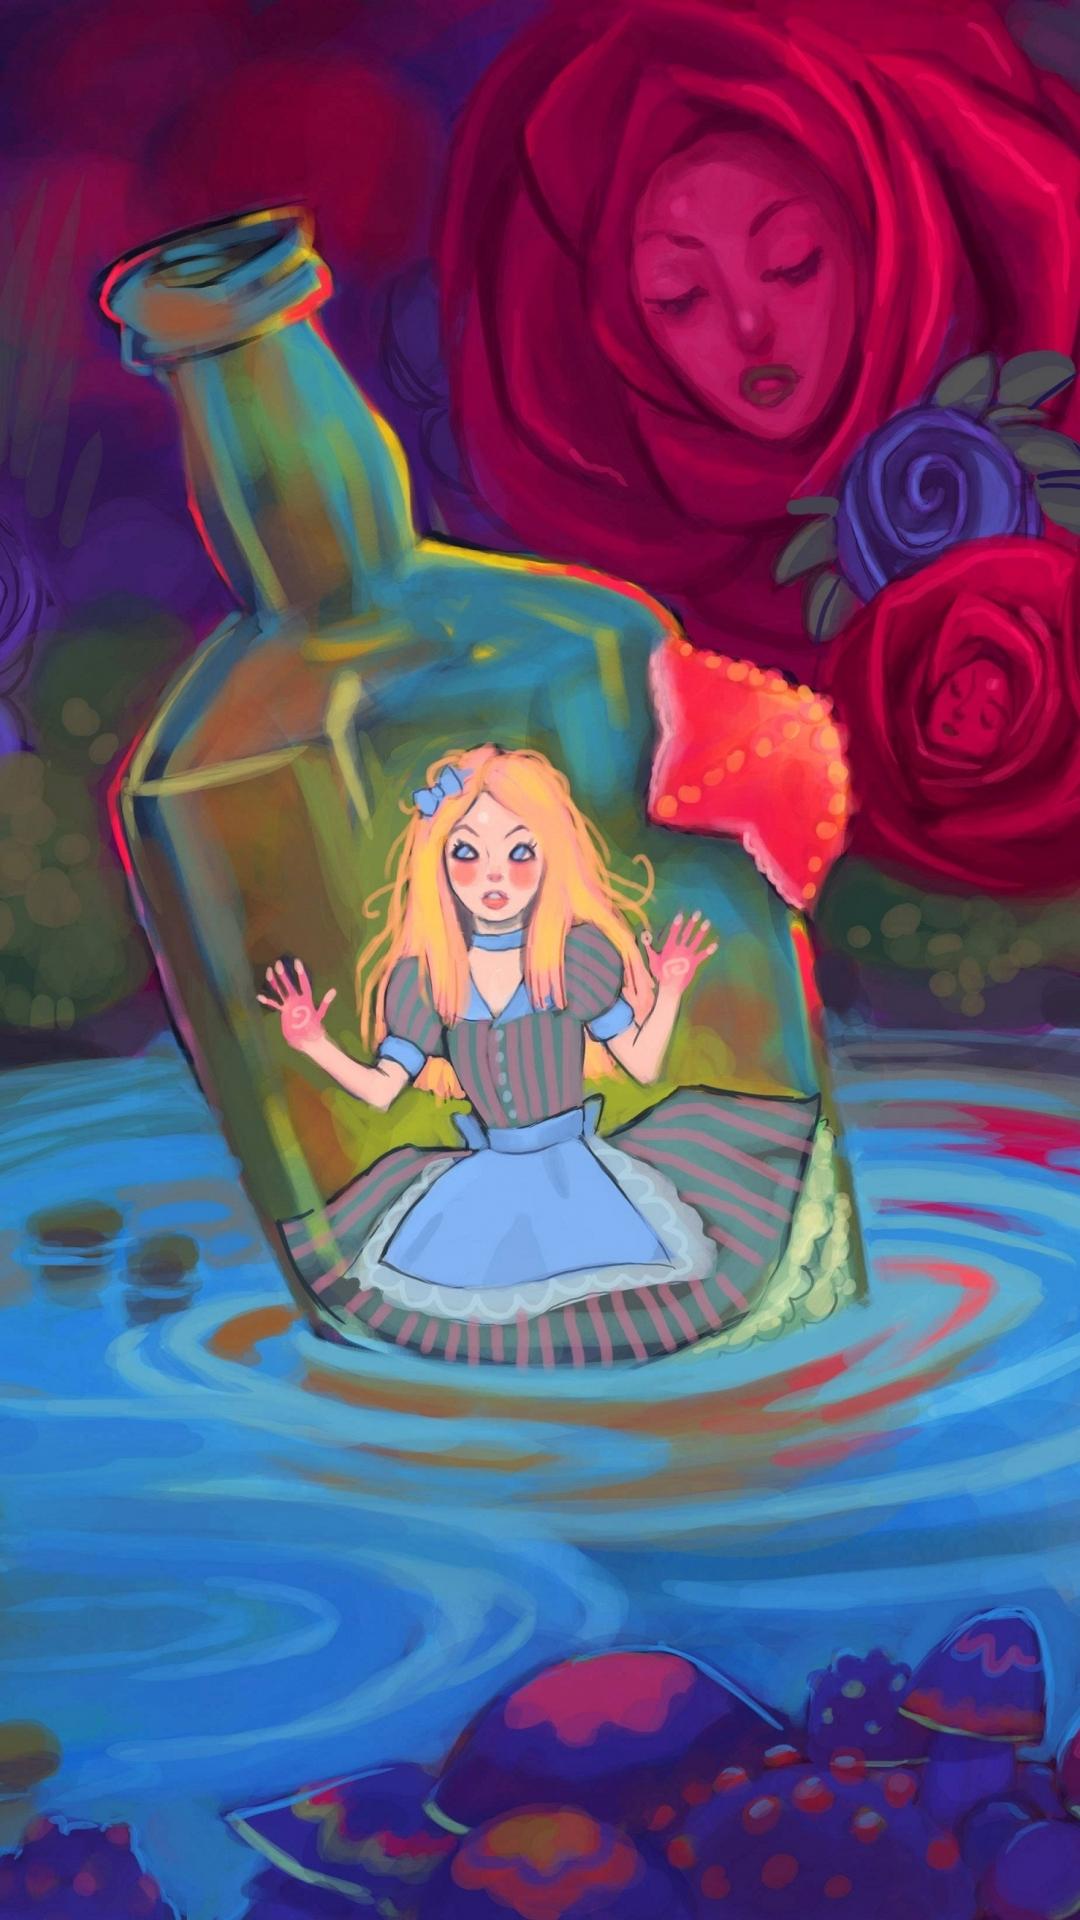 Wallpaper iphone alice wonderland - Fantasy Alice In Wonderland Wallpaper 569155